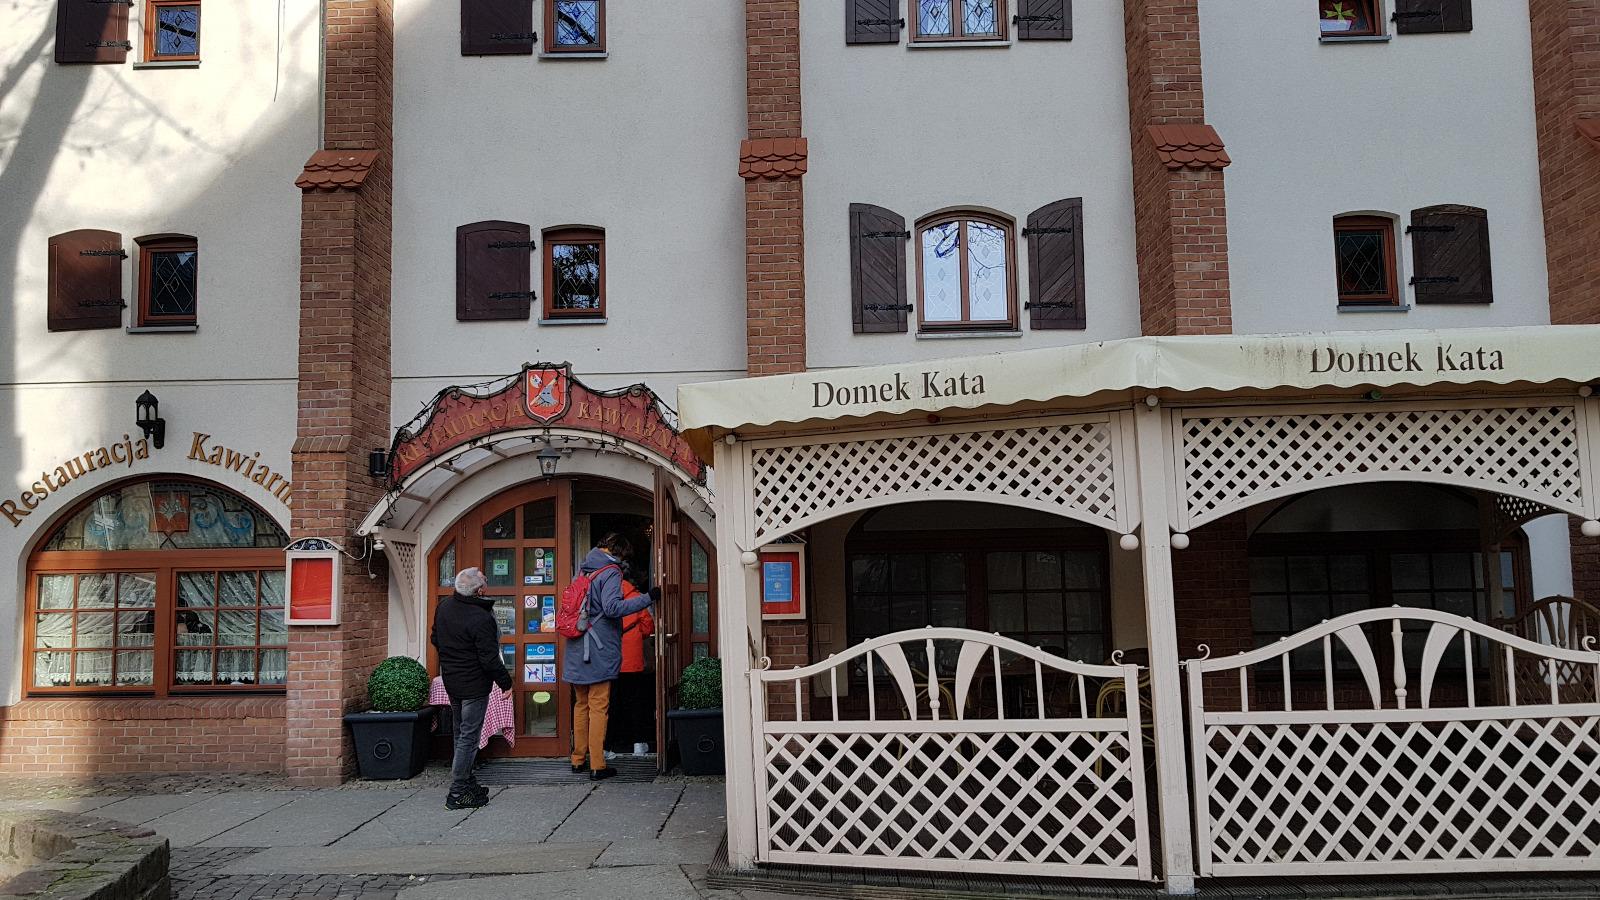 https://www.eberhardt-travel.de/reisebilder/reisetipp/ein-besuch-im-henkerhaus-in-kolobrzeg-kolberg/original/1888361